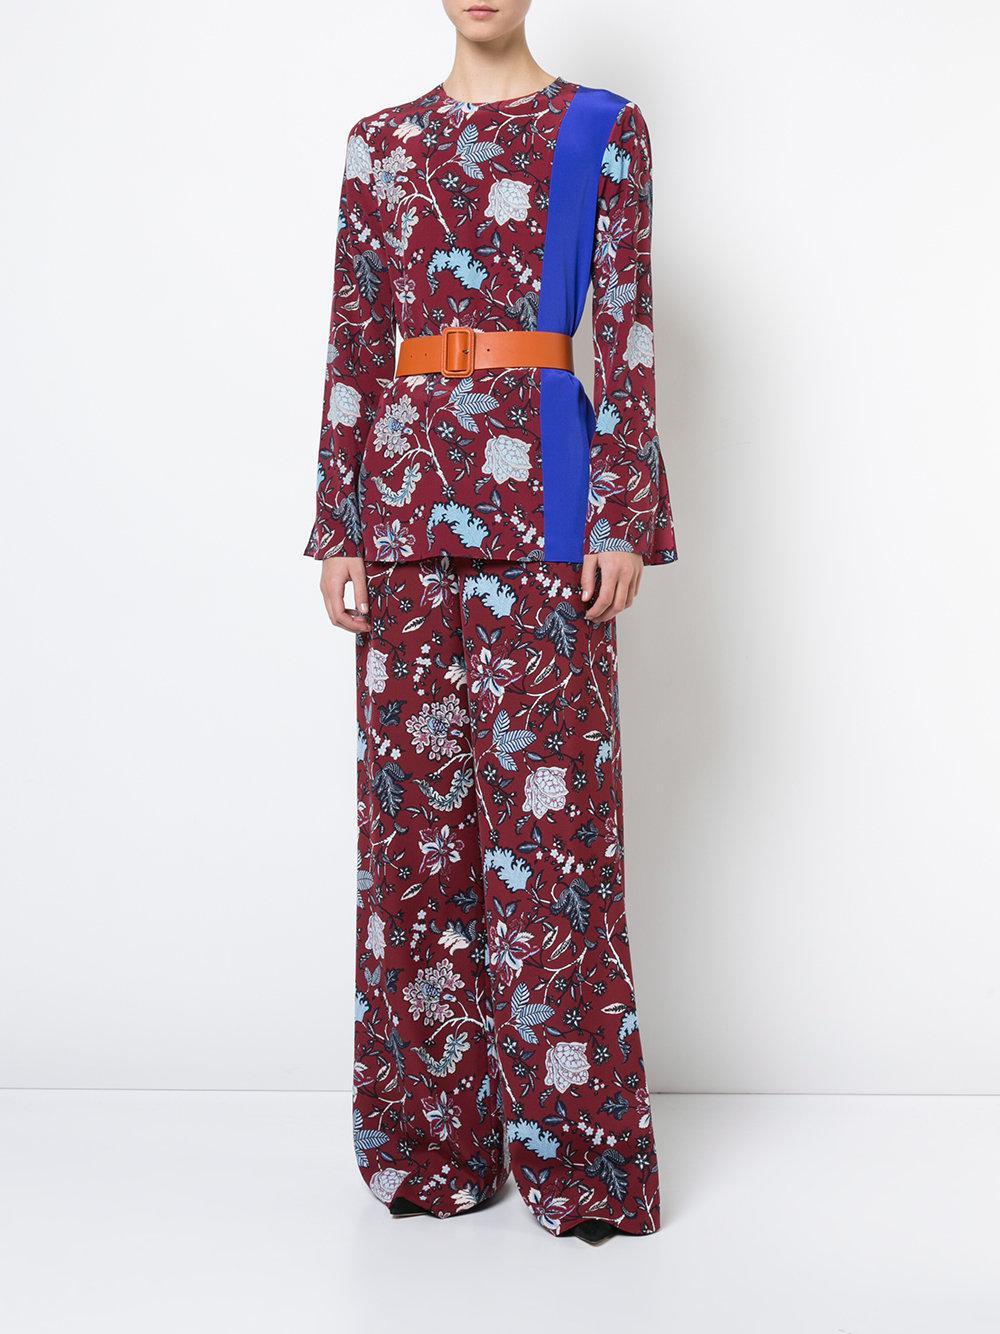 ae298a246afdb Diane von Furstenberg - Multicolor Canton Floral Blouse - Lyst. View  fullscreen